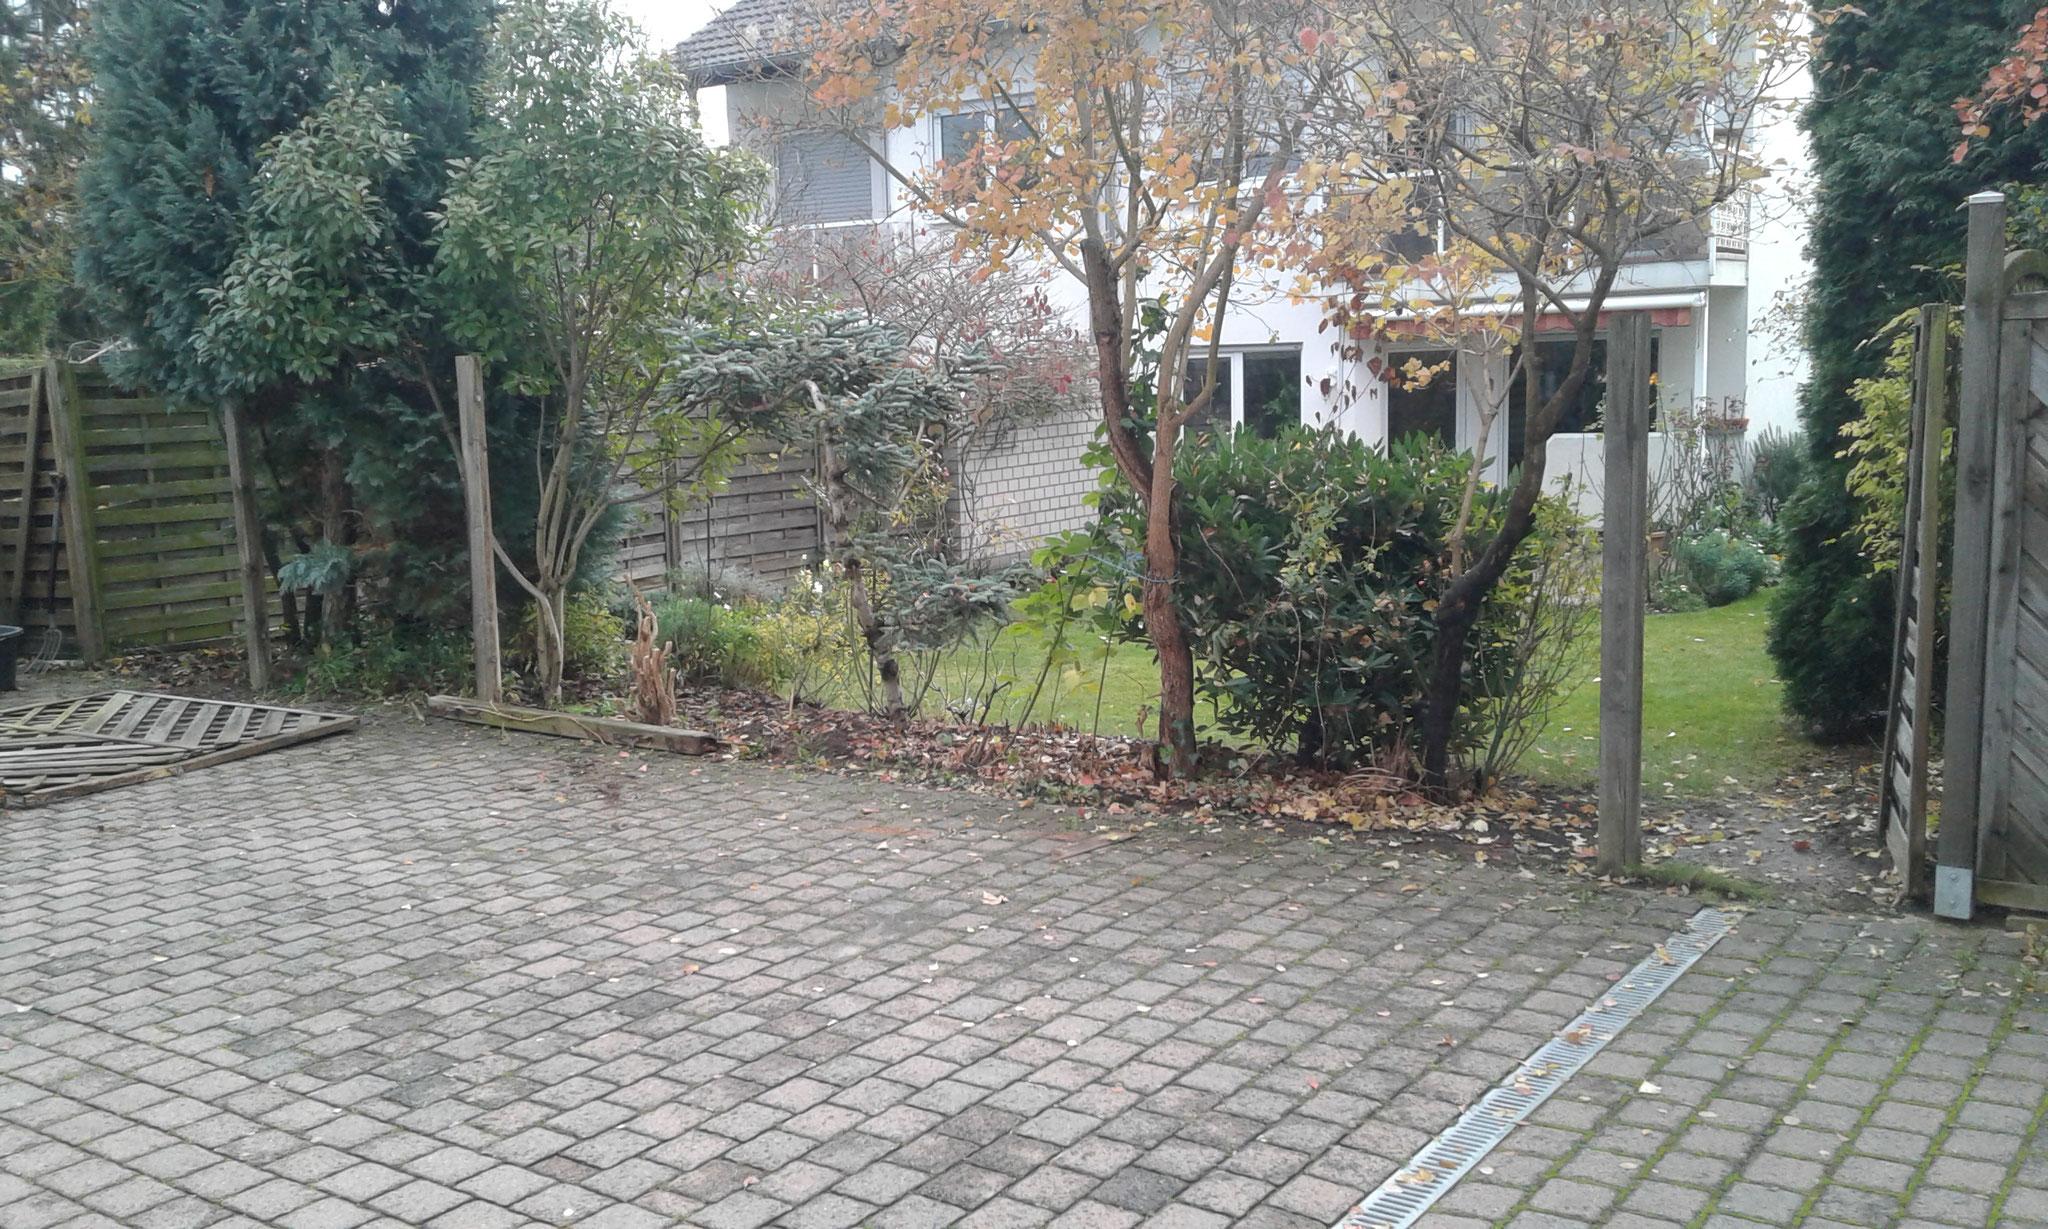 Zaunbauprojekt Mainz 2017 - Abbau